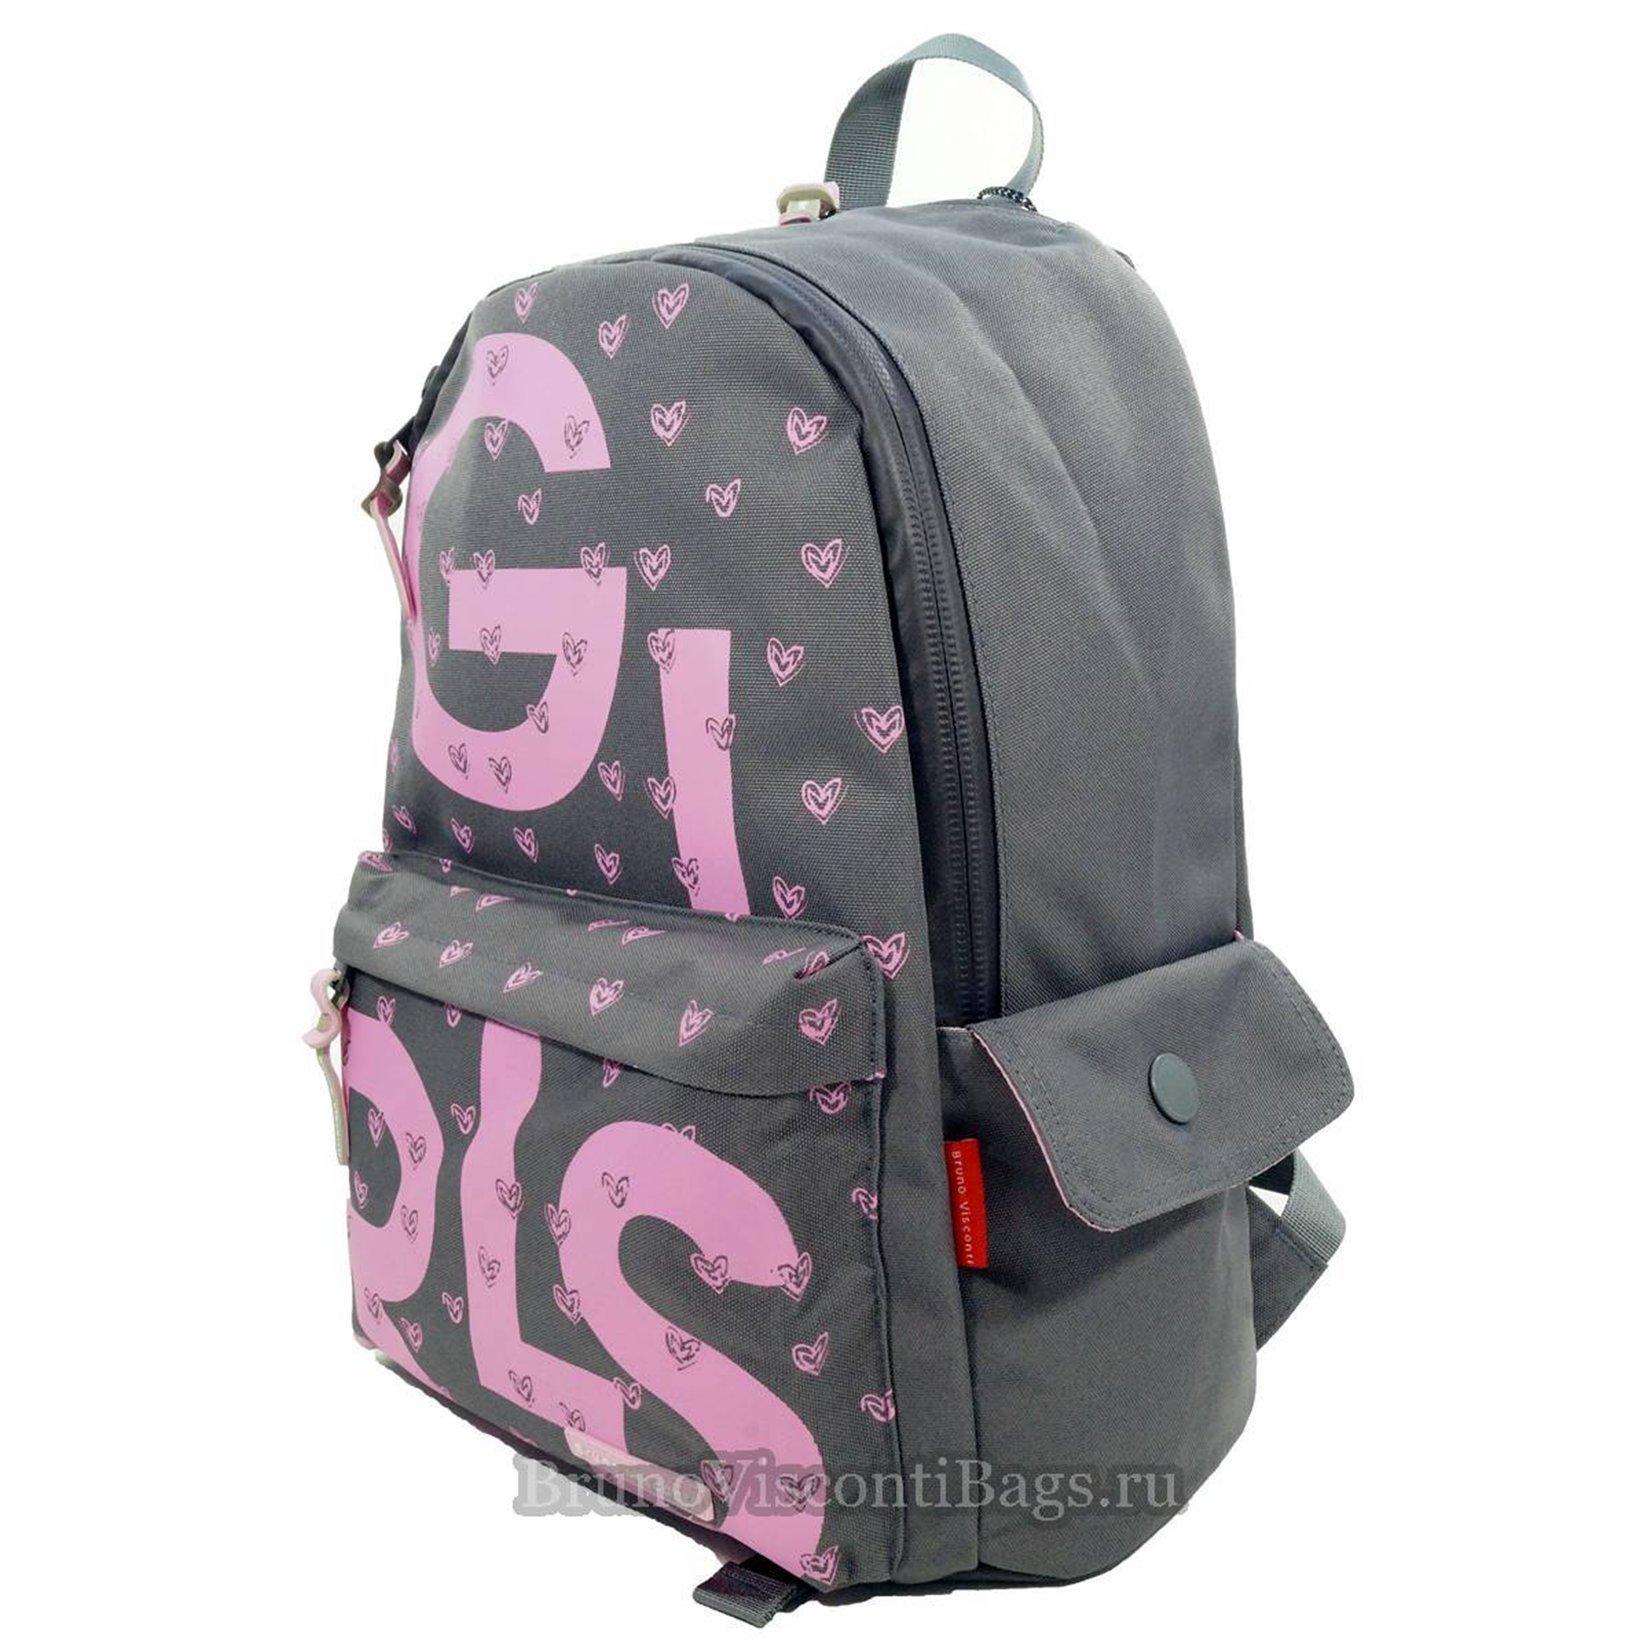 5a89f328ad76 Школьный рюкзак BrunoVisconti Girls серый (Teens)